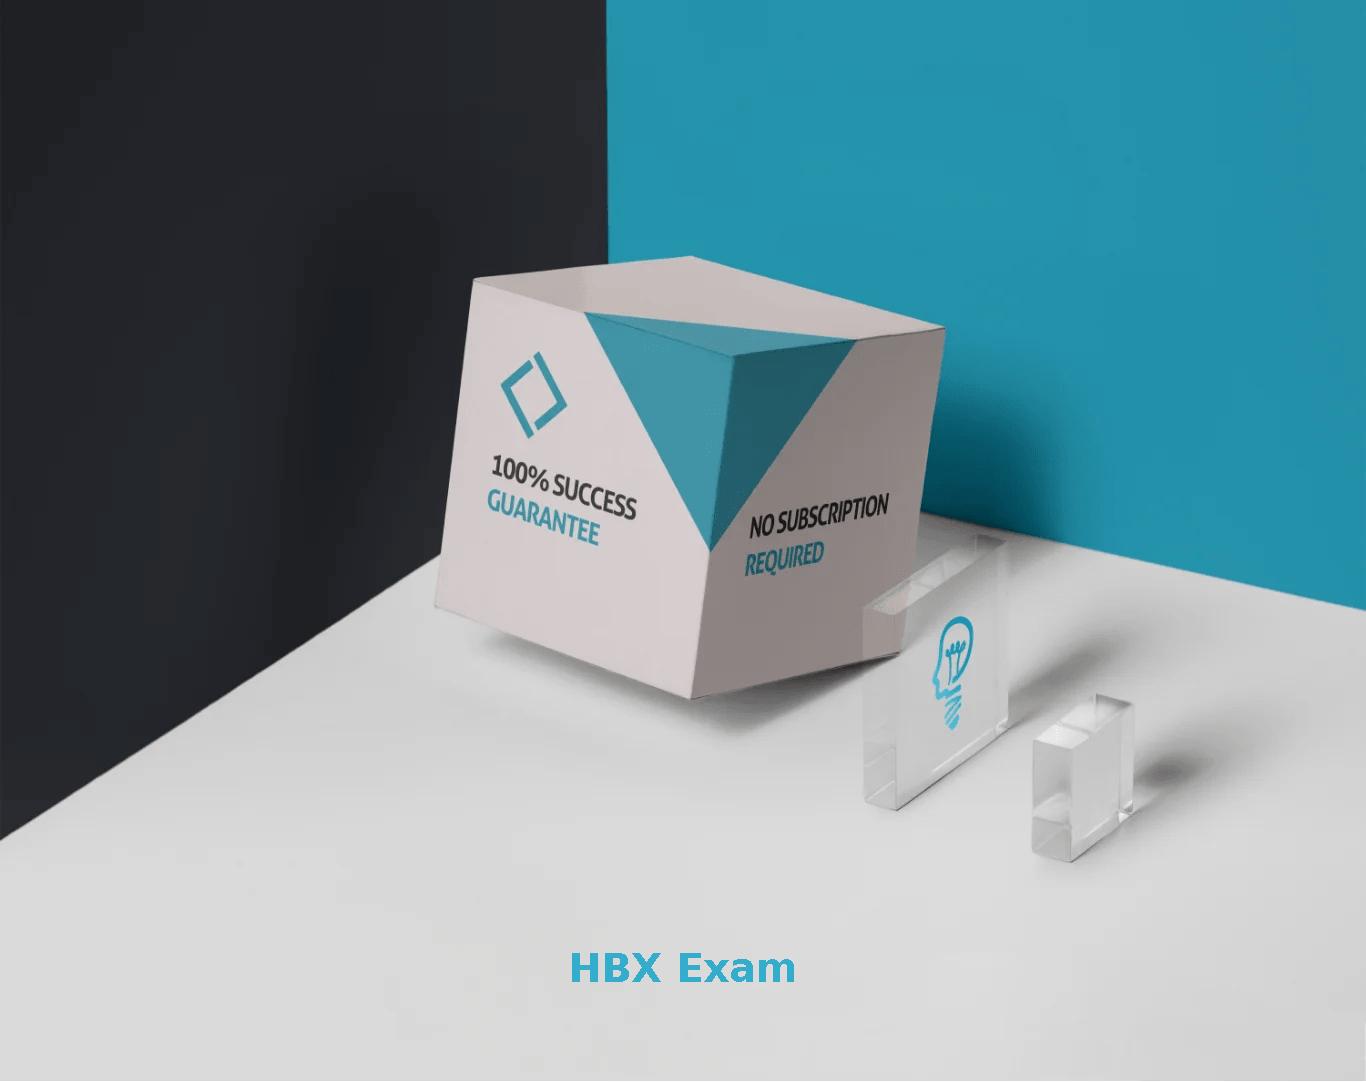 HBX Exam Dumps